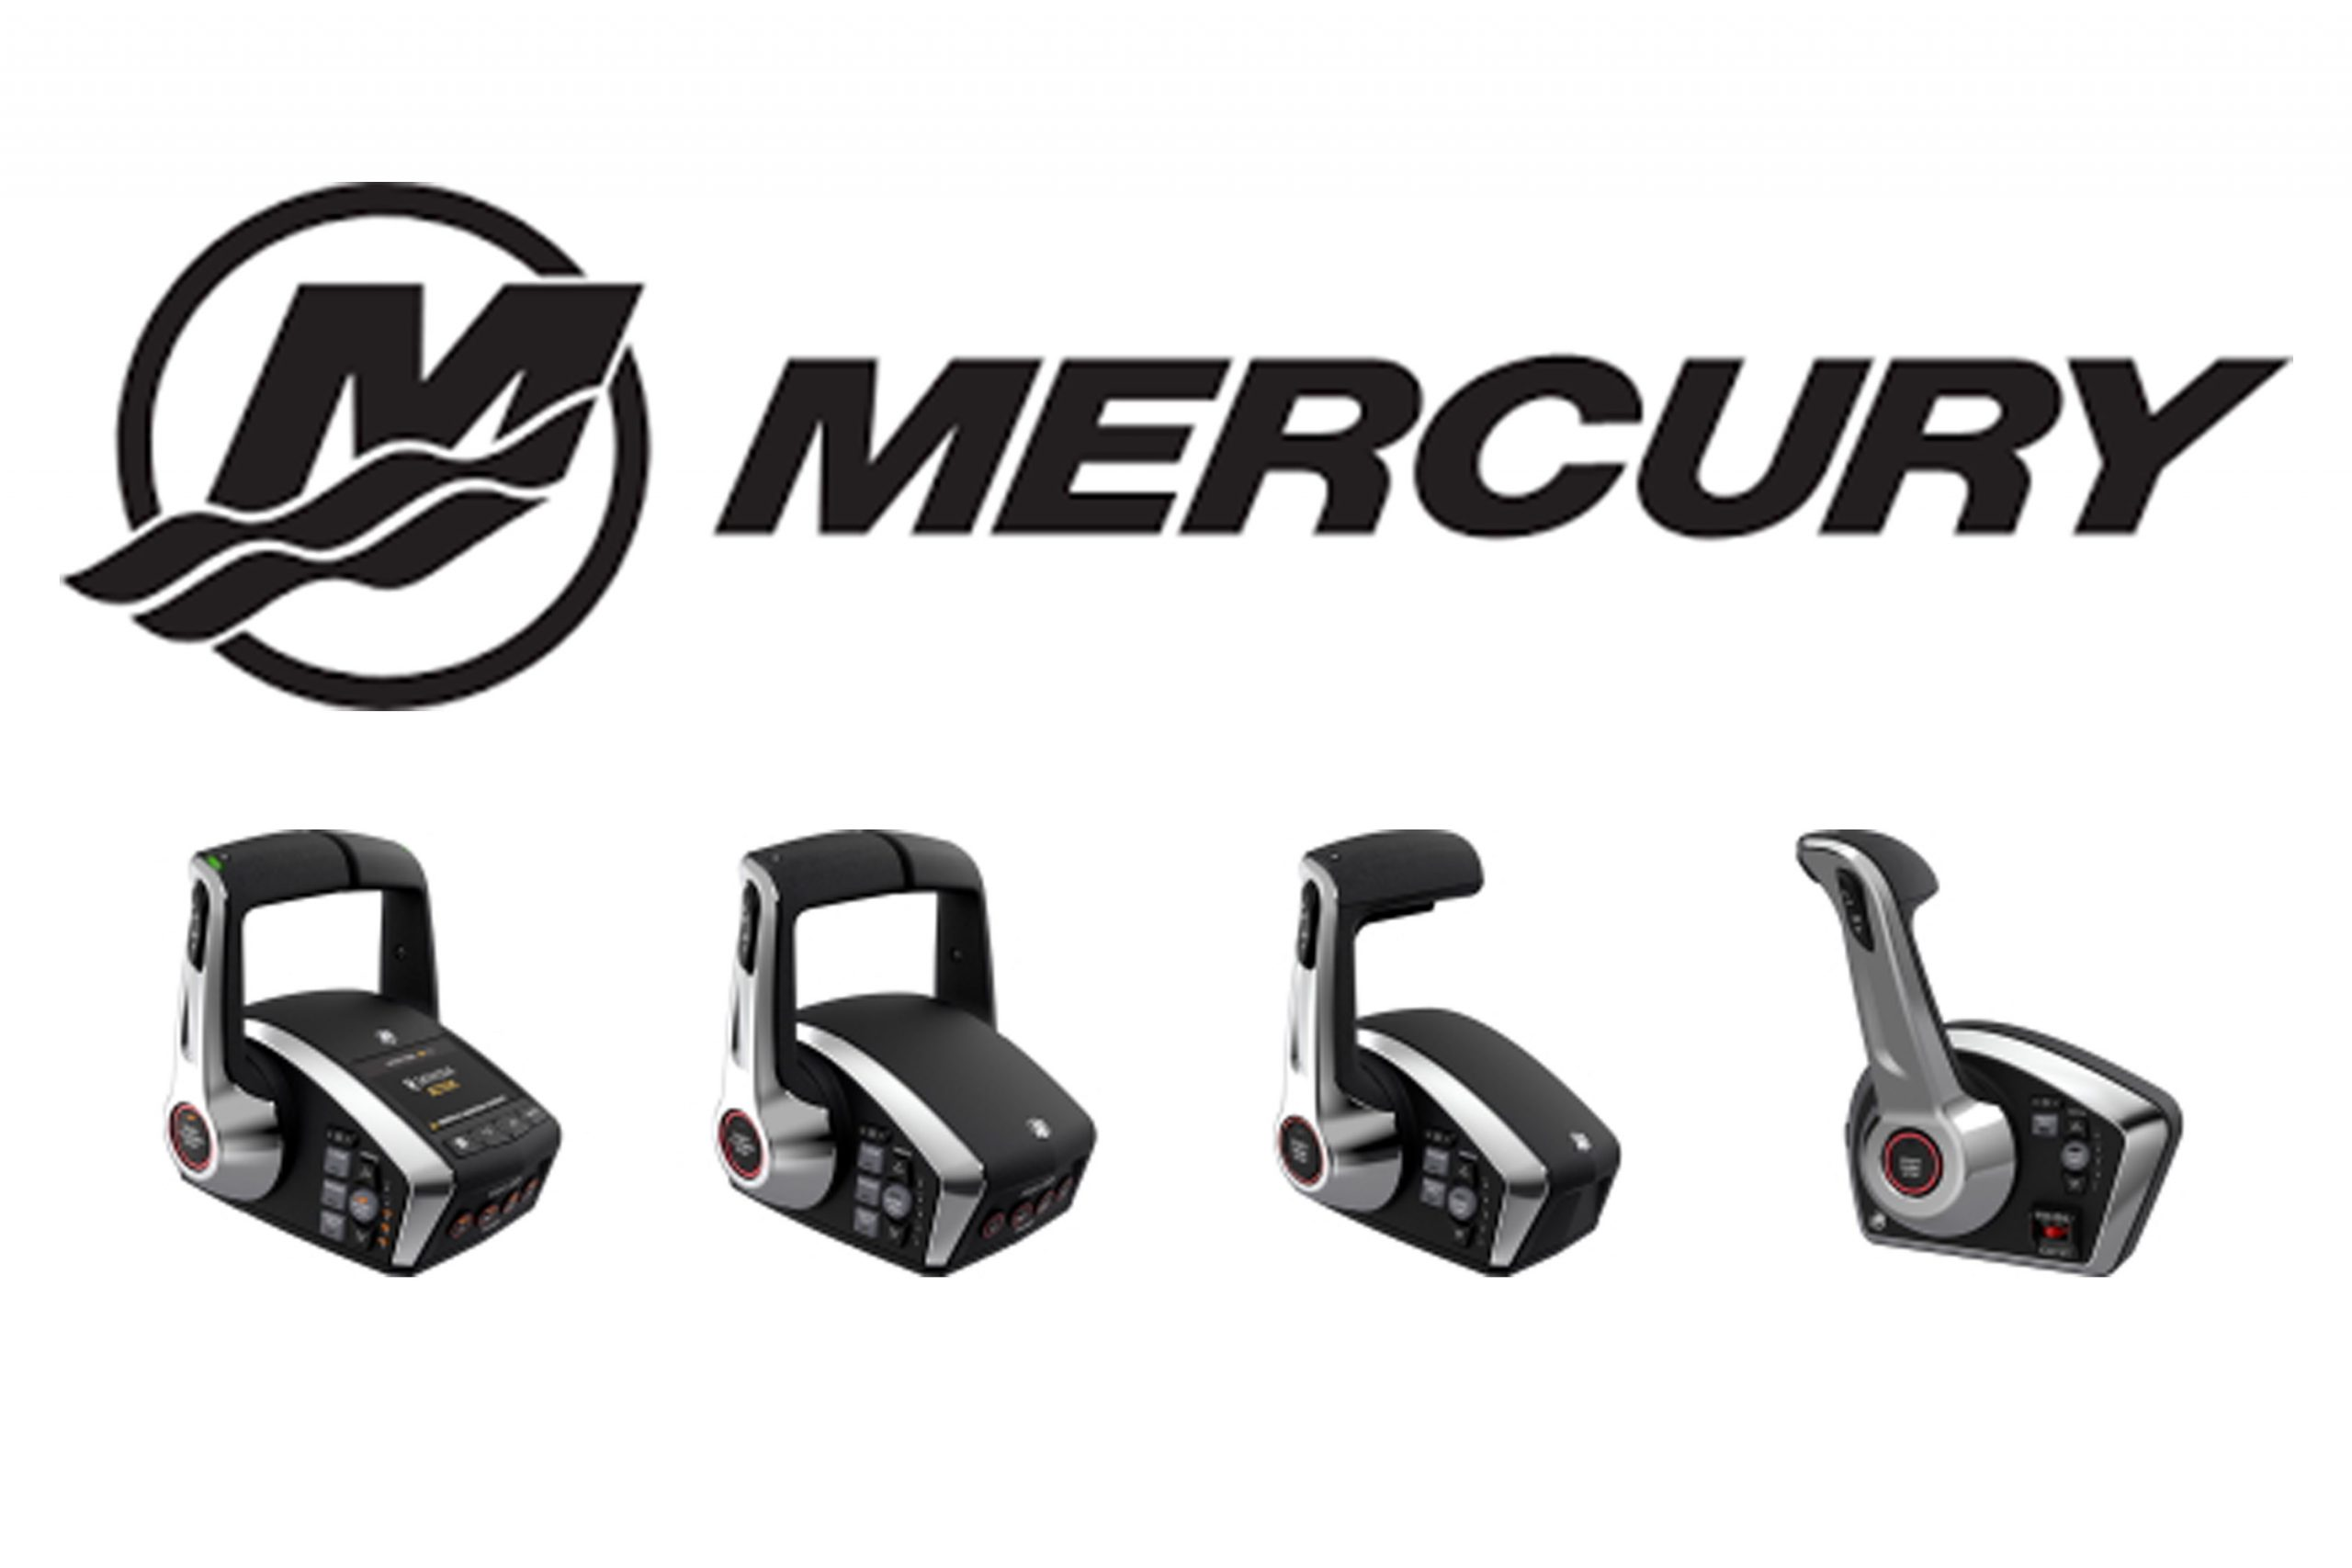 Mercury Throttle Controls